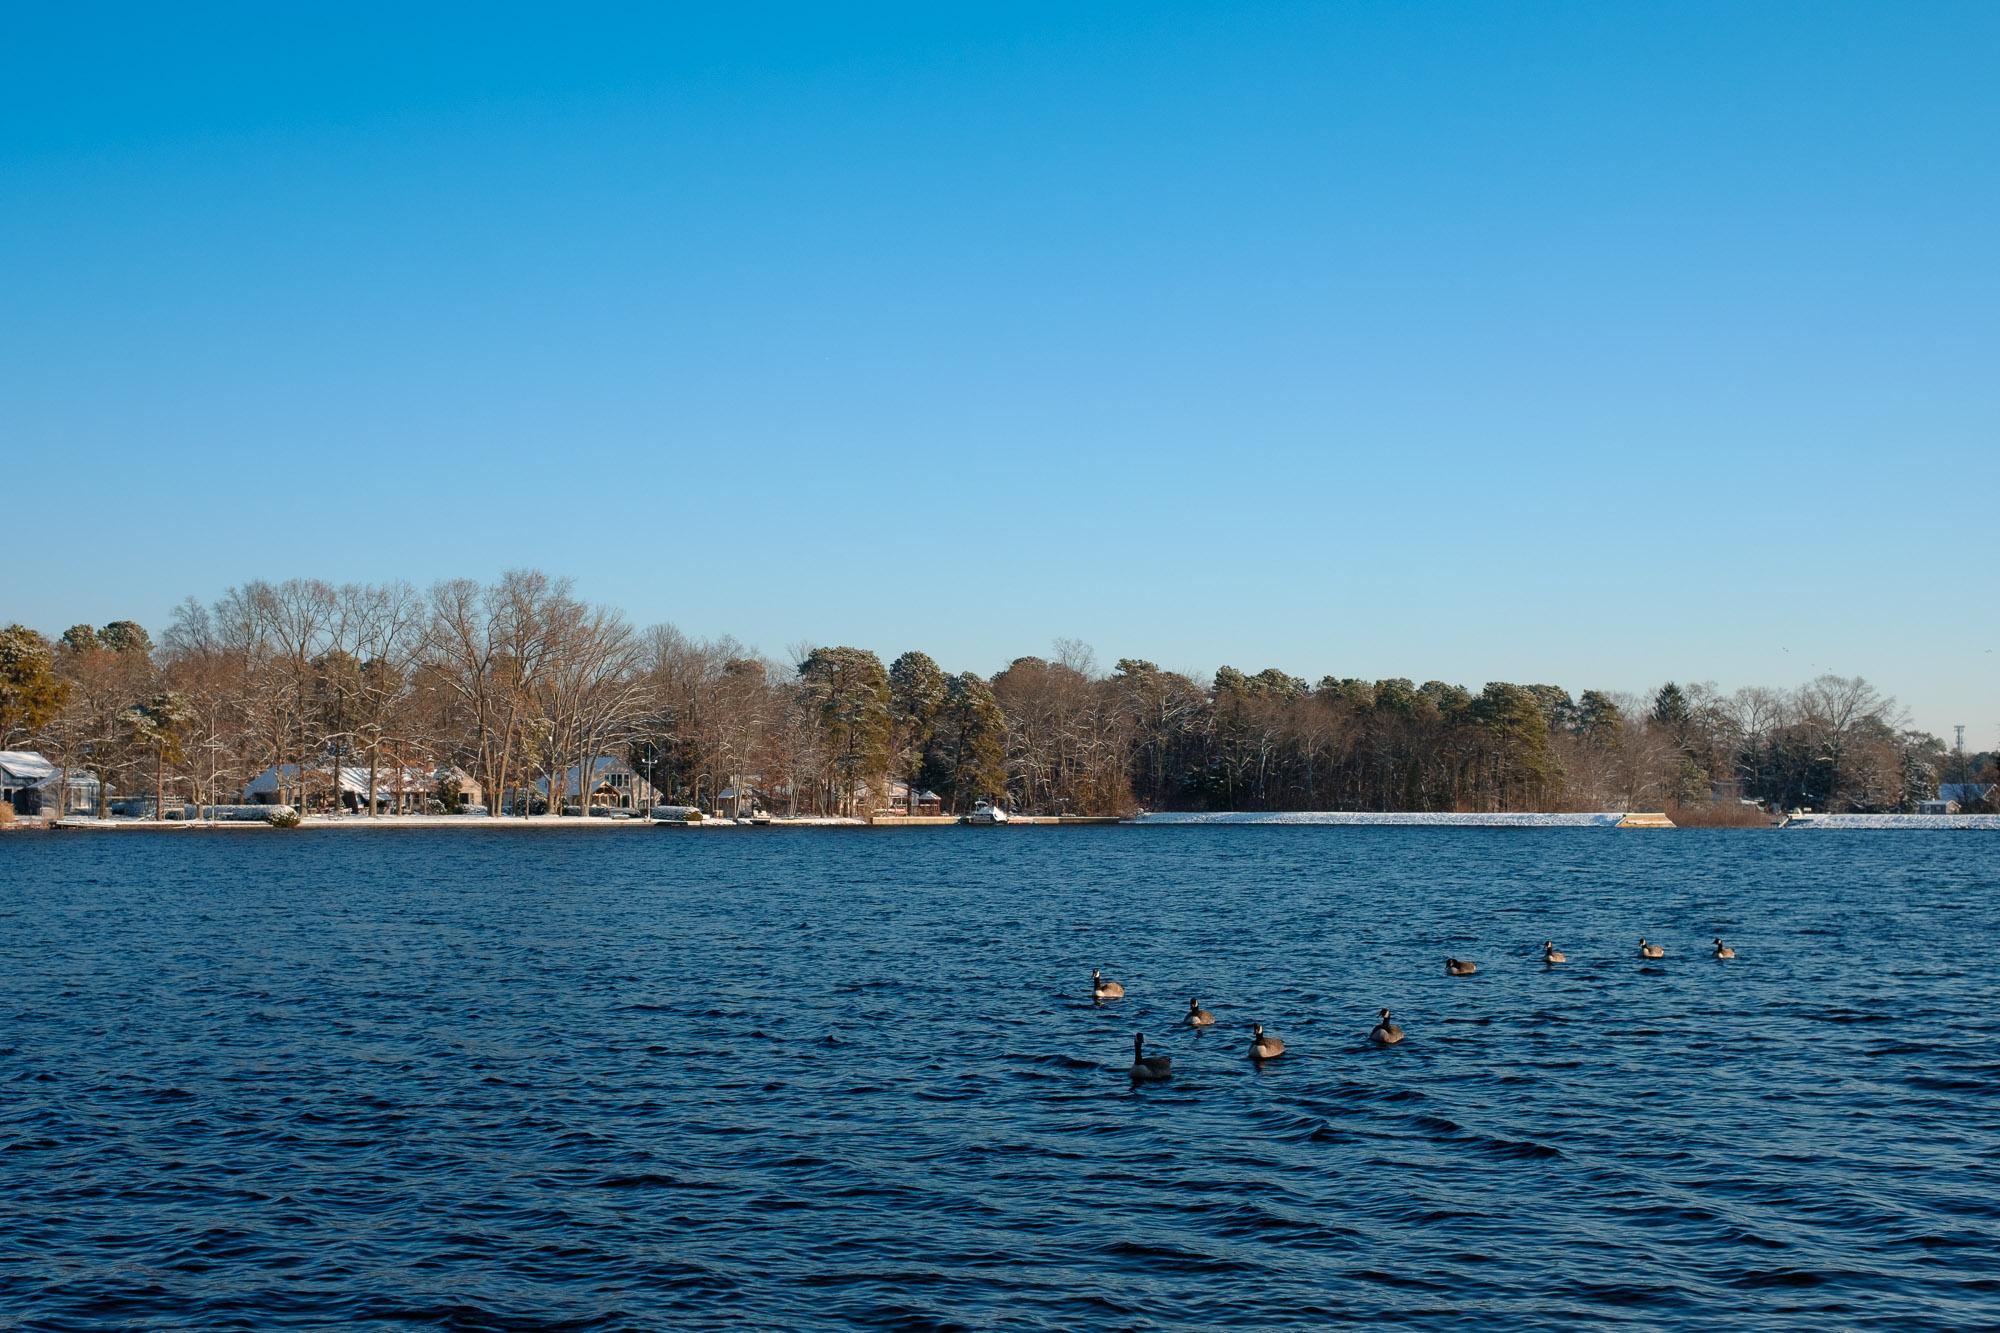 Floating Geese